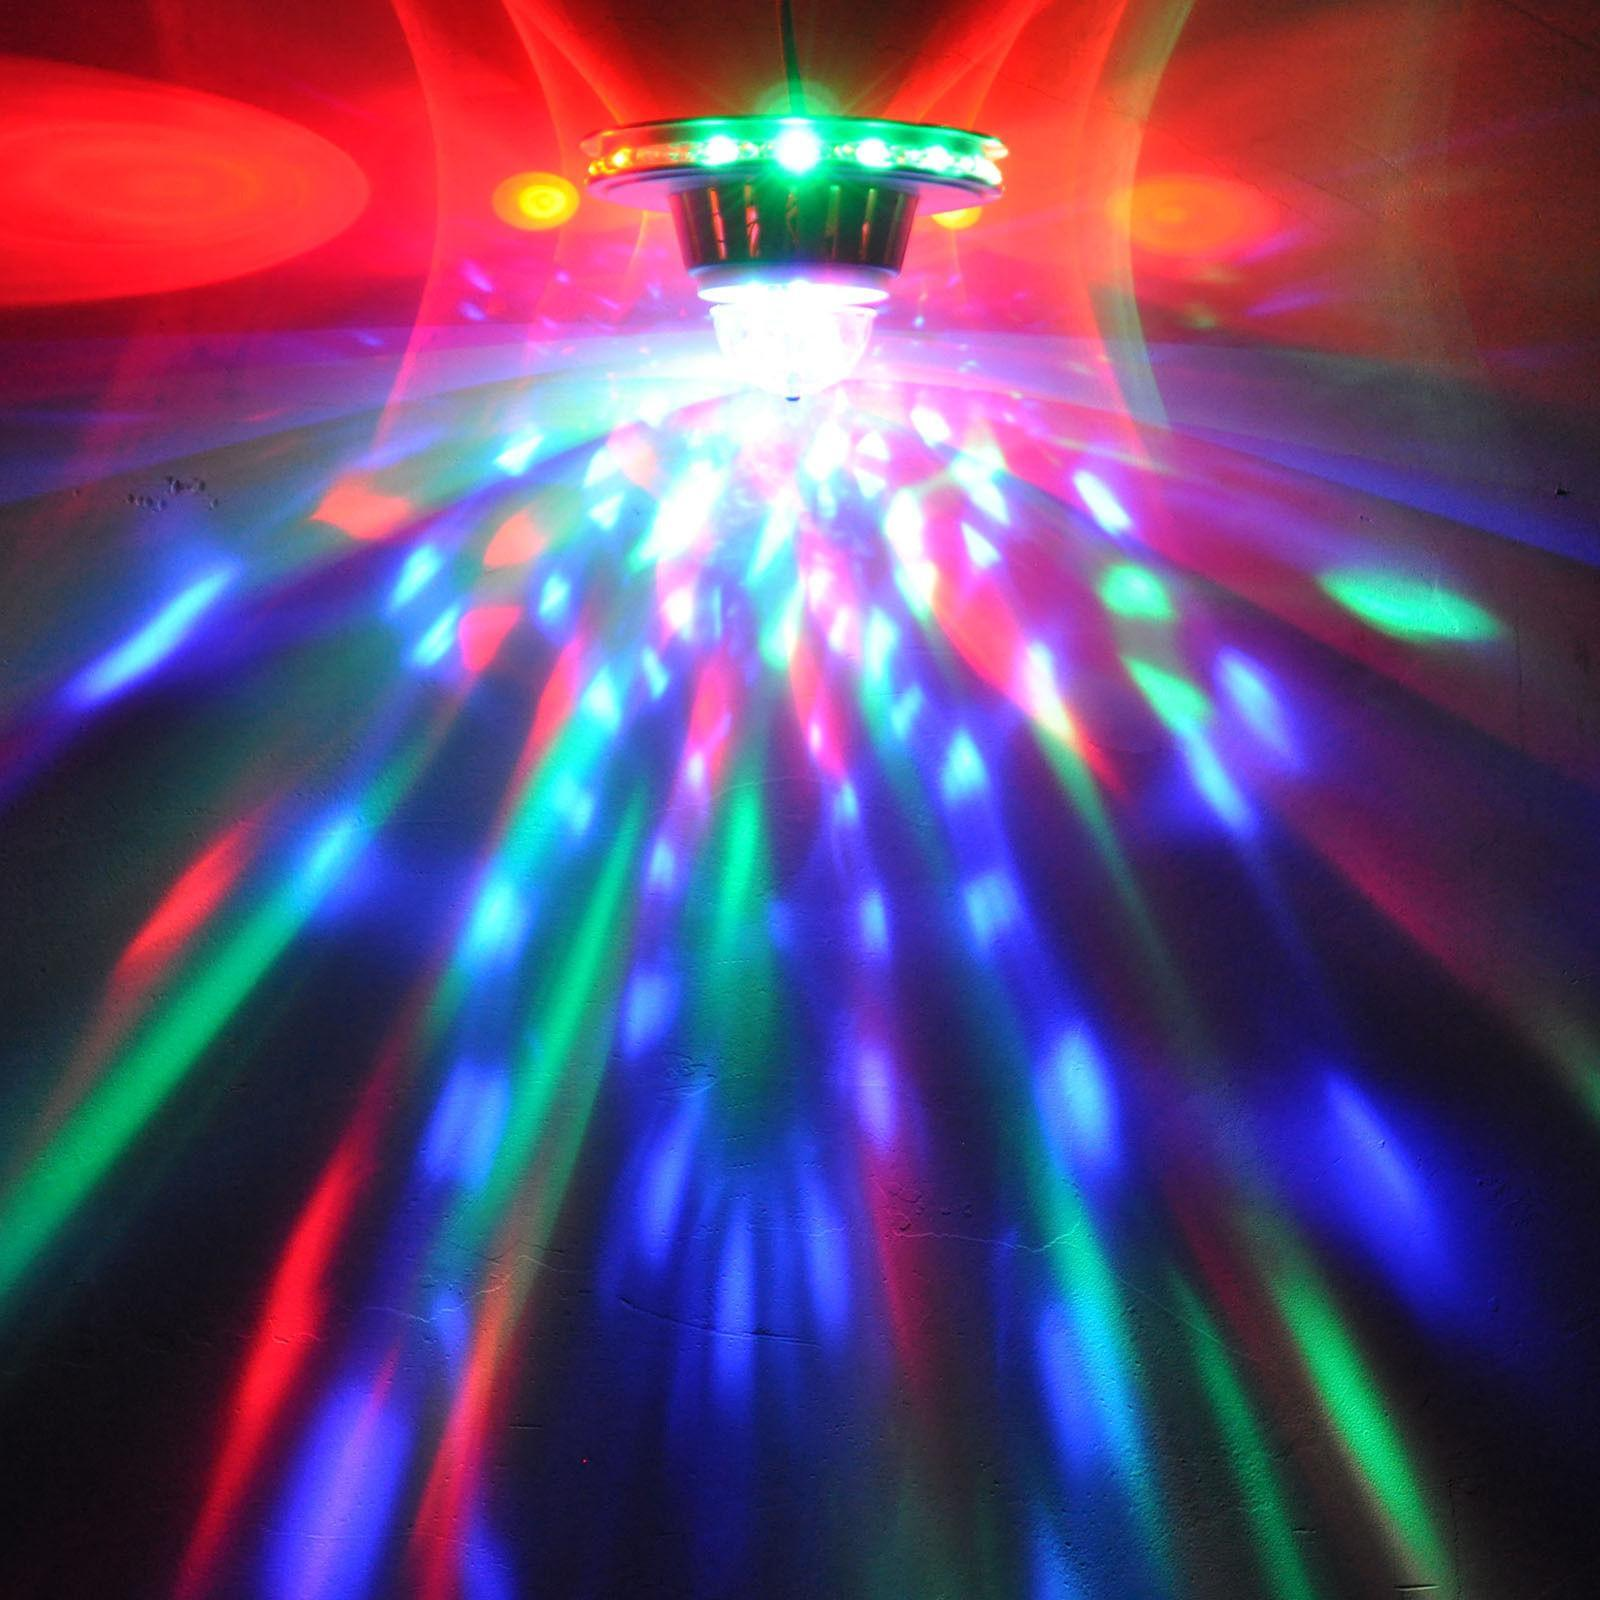 50PCS 48LEDS 8W الدوارة RGB LED لمبة الكرة تغيير لون البلورة السحرية عباد الشمس الخفيفة RGB ضوء المرحلة بقيادة آثار لعيد الميلاد حزب ديسكو